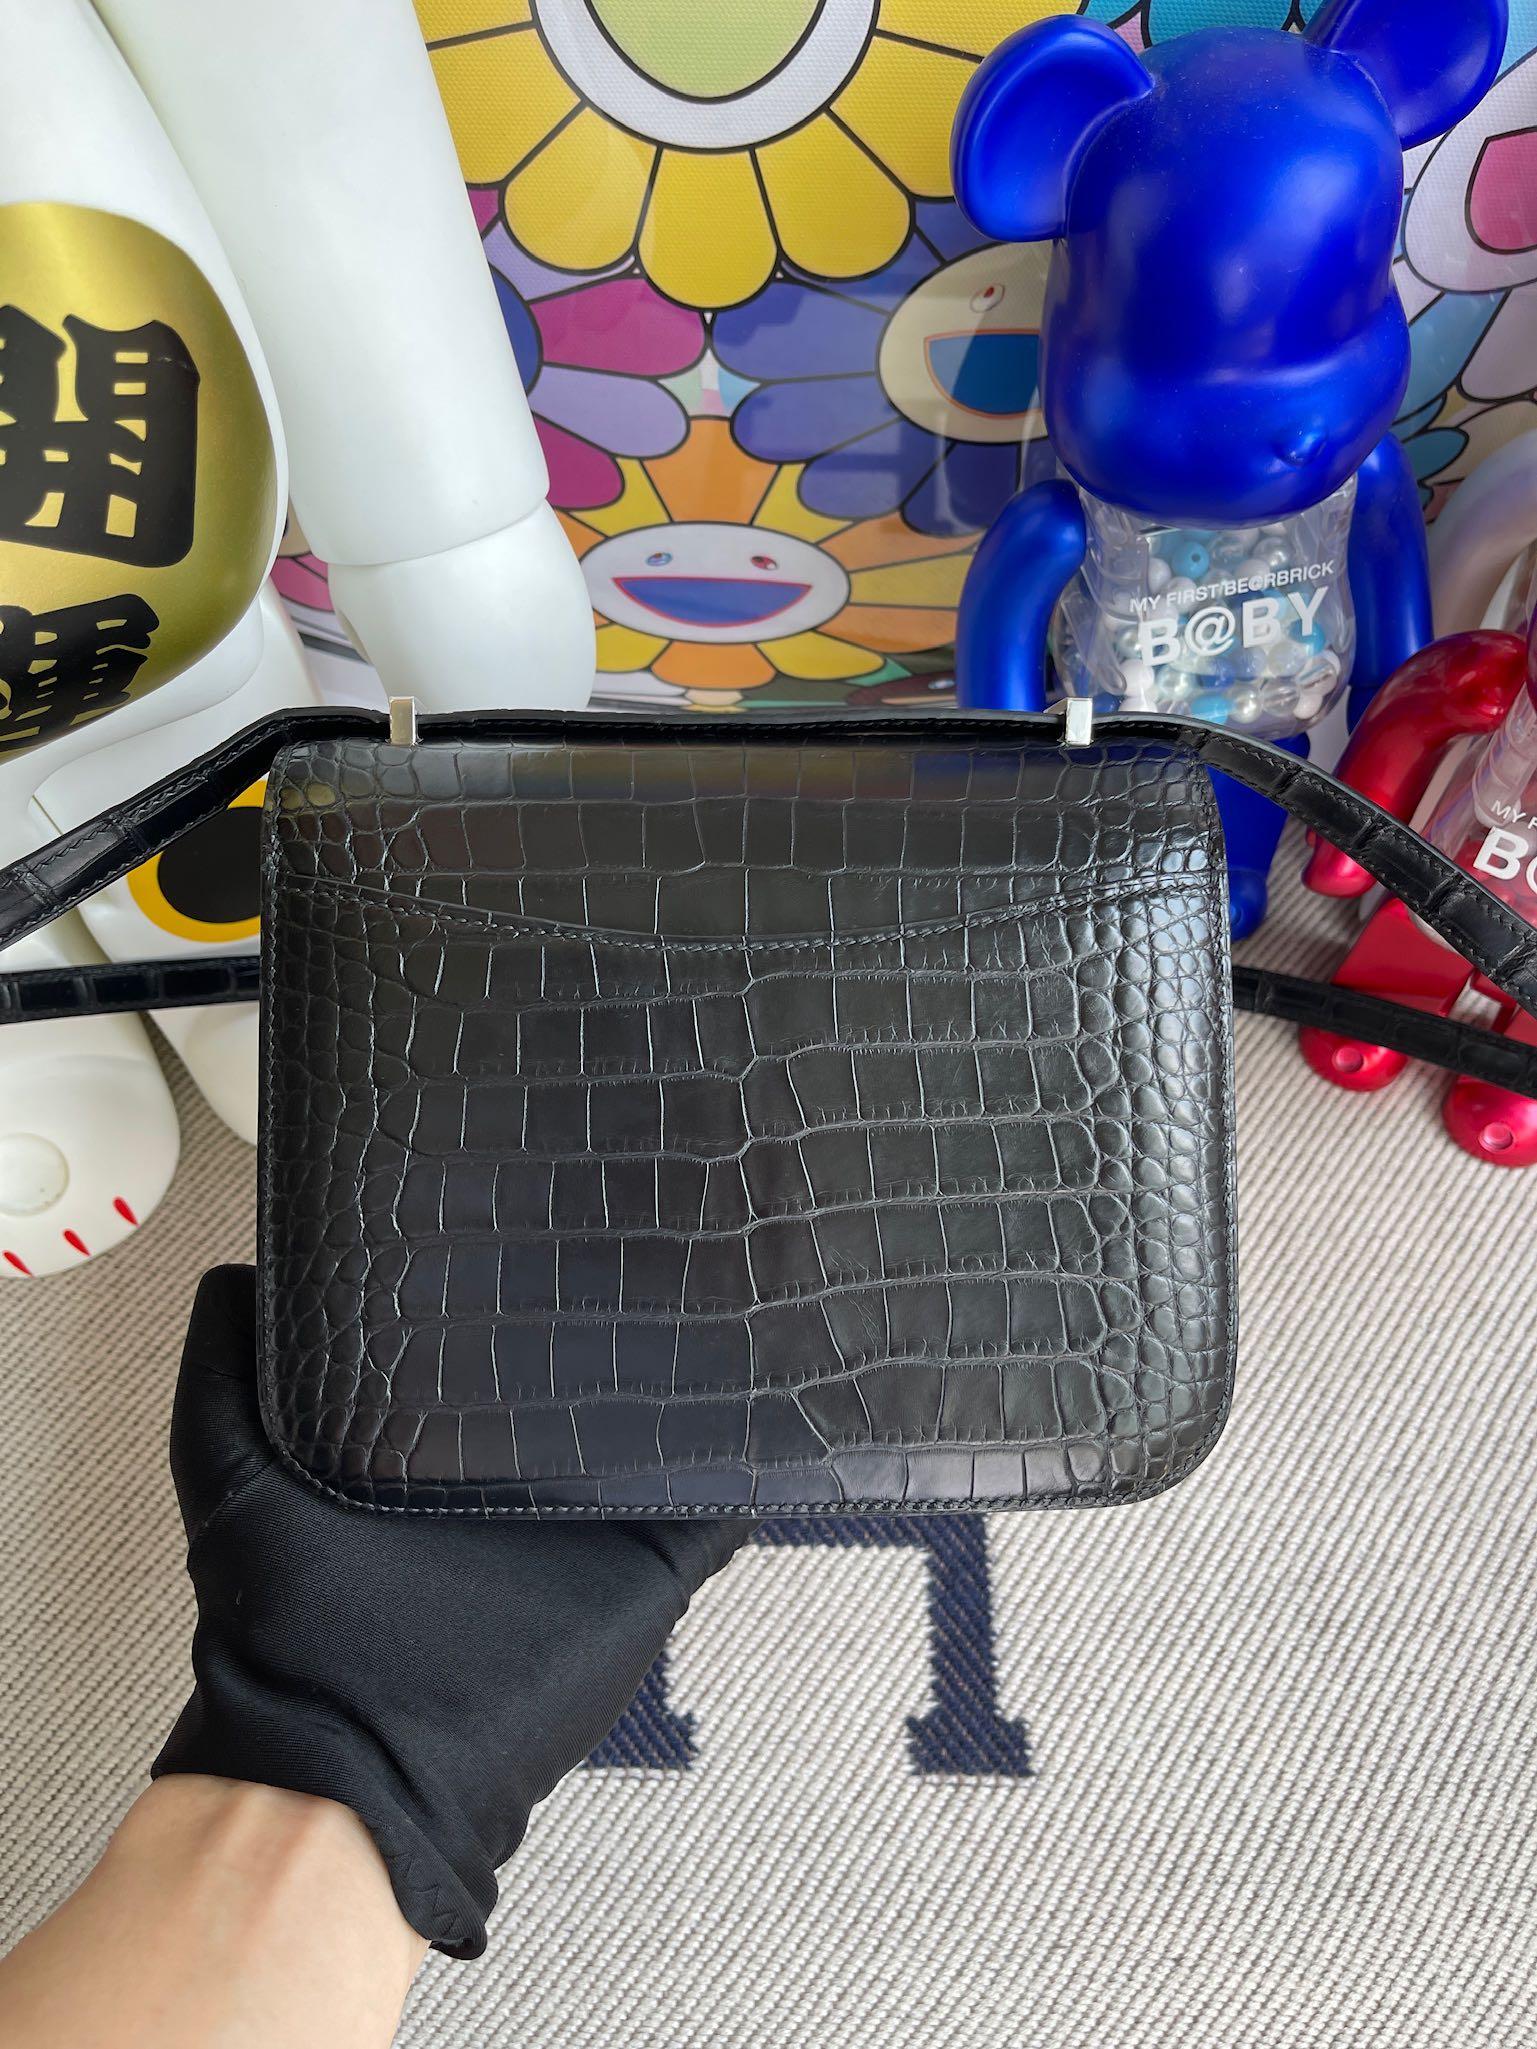 Hermès(爱马仕)Constance 空姐包 Alligator matt 雾面鳄鱼 89 黑色 拼蜥蜴扣 18cm 顶级手缝 定制